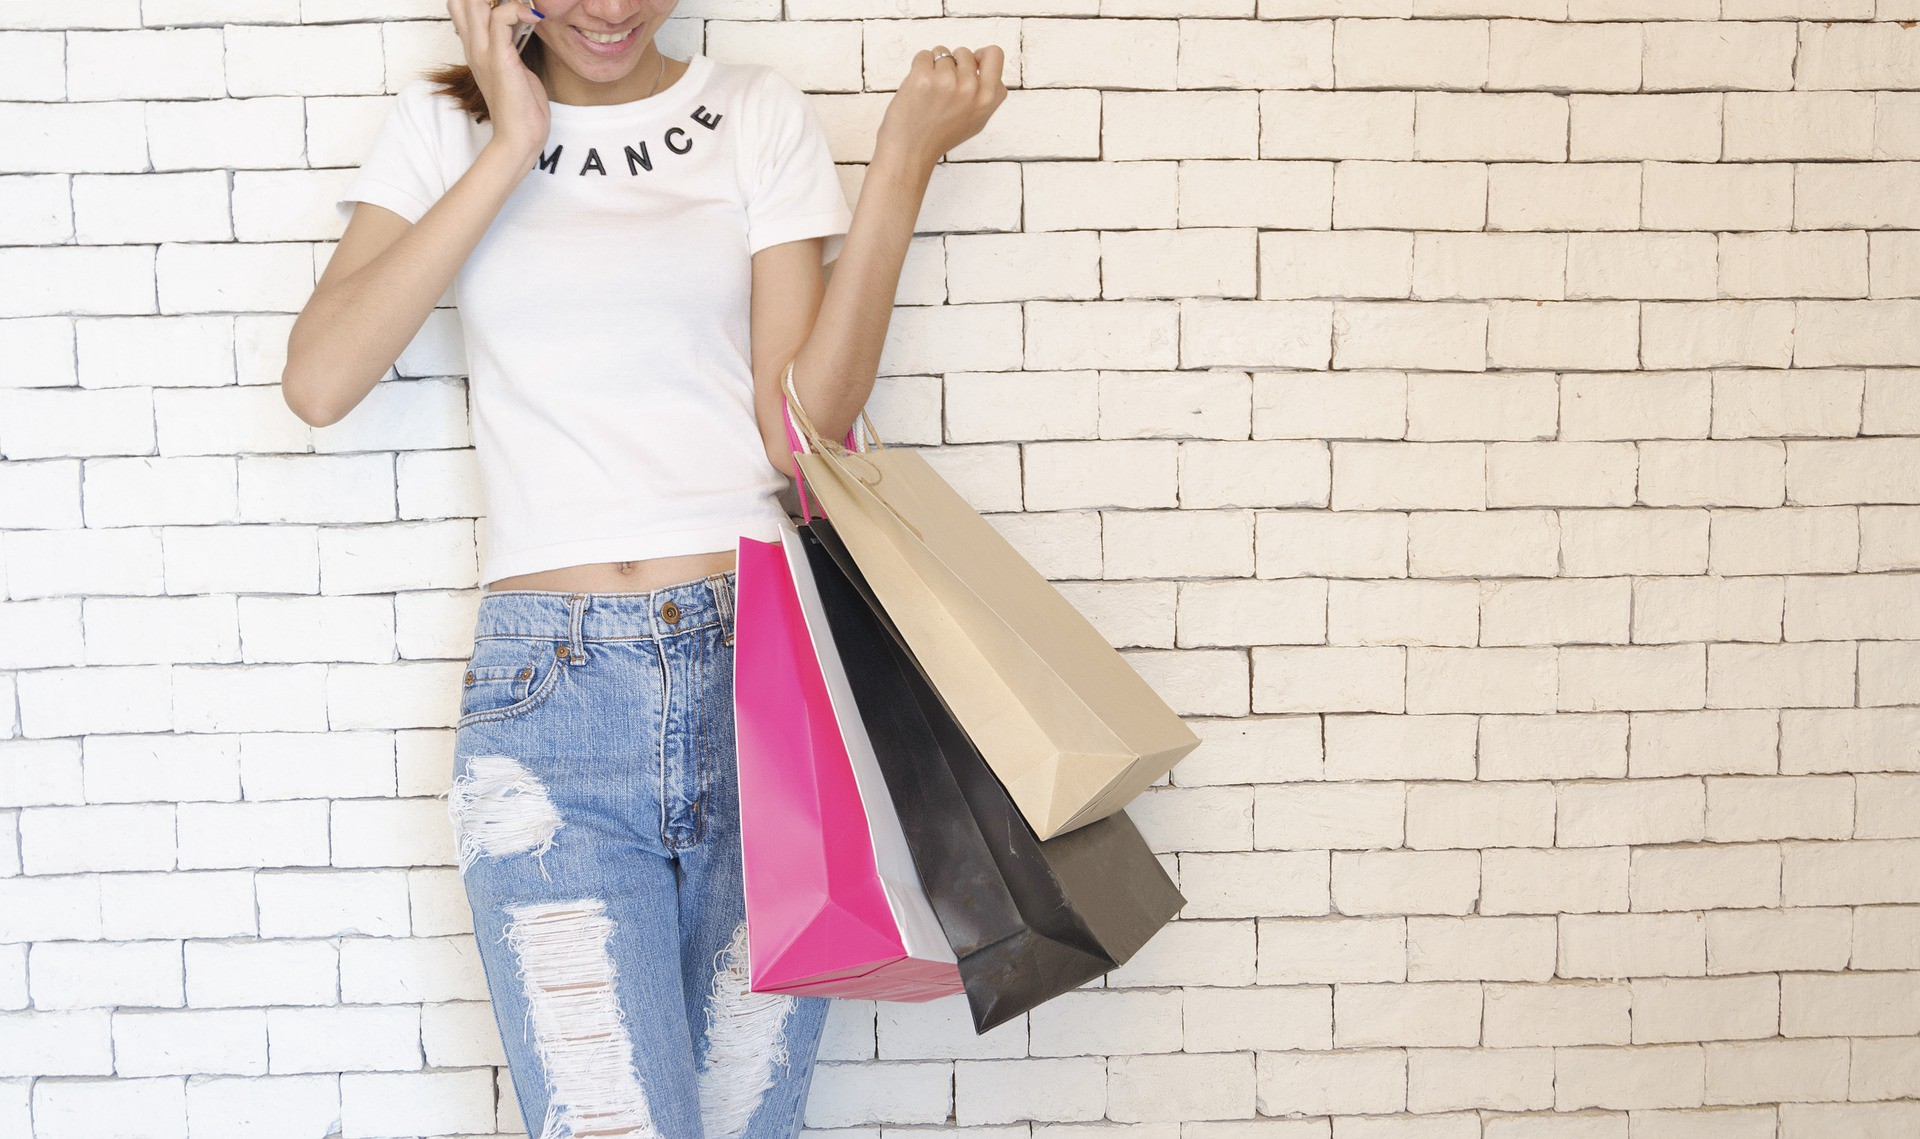 Young-Shoppers-Near-Data-Platform